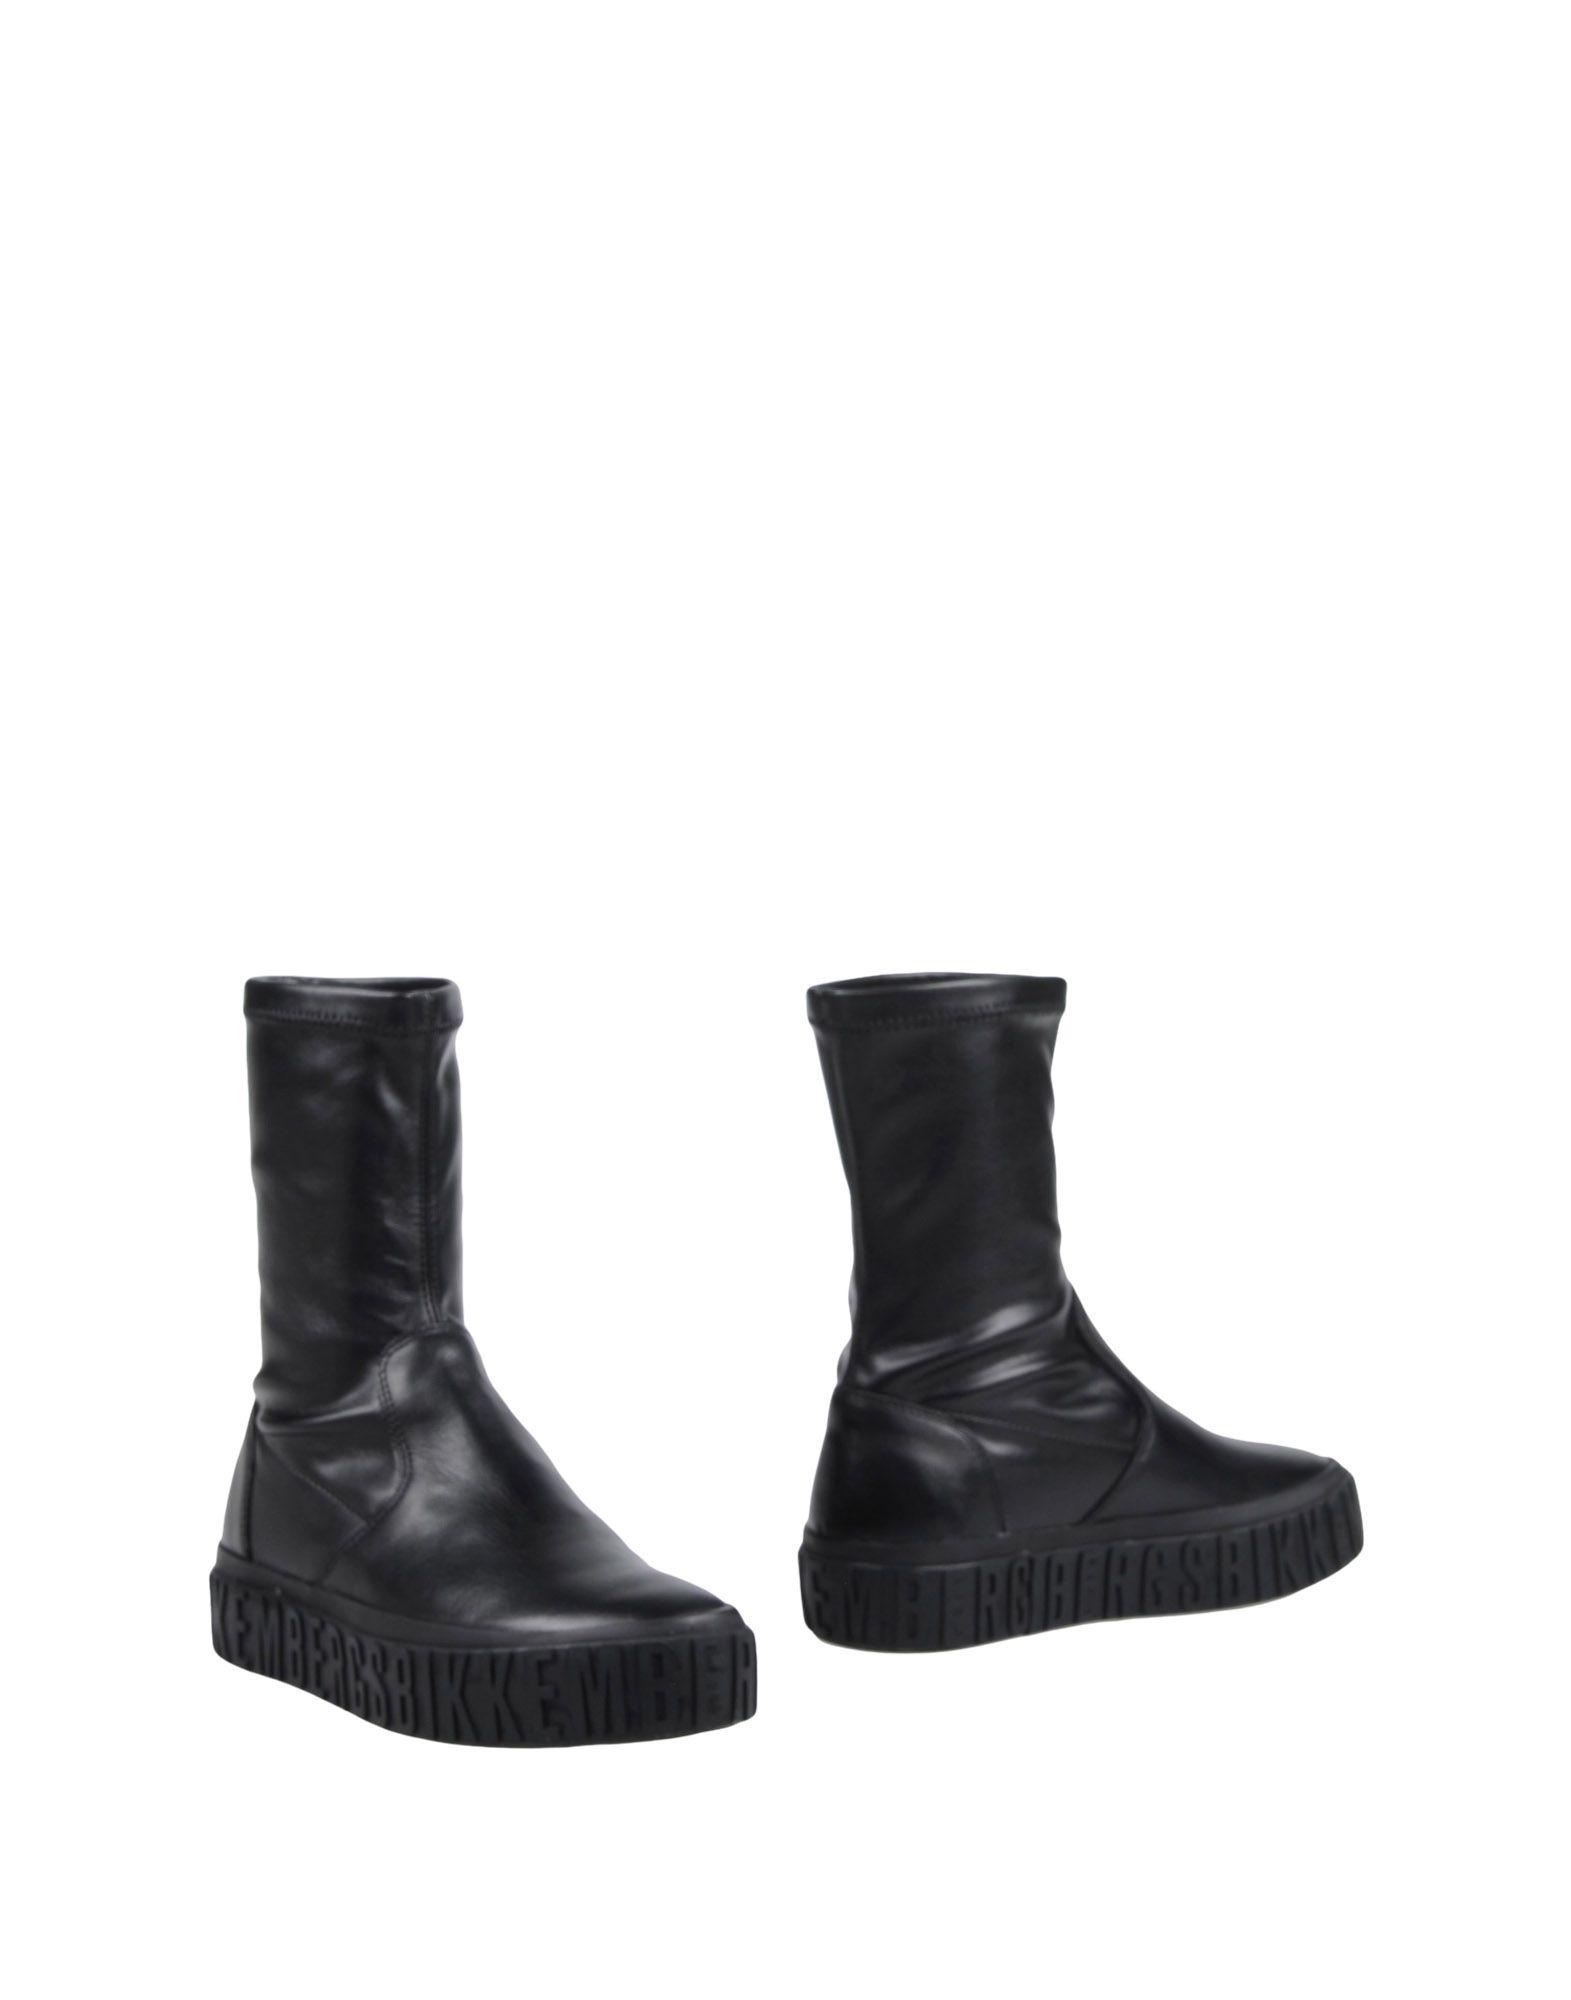 Bottine Bikkembergs Femme - Bottines Bikkembergs Noir Dernières chaussures discount pour hommes et femmes